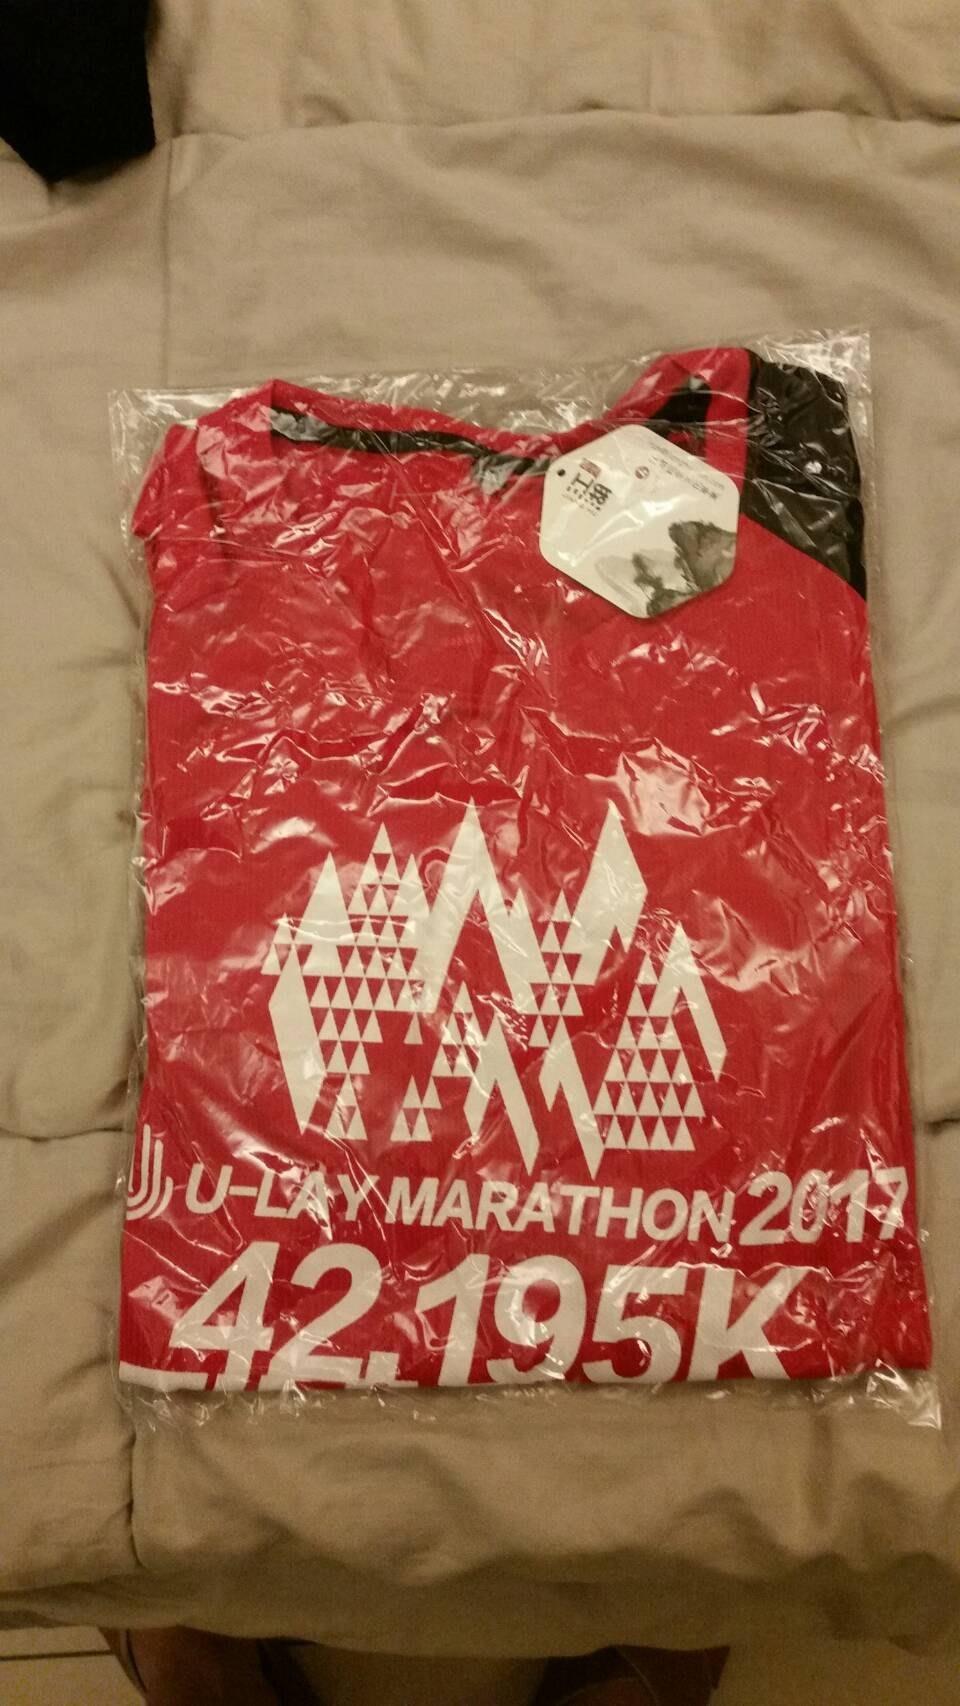 U-LAY 烏來馬拉松2017路跑排汗衫江湖跑堂設計完賽衣2XL.200起標